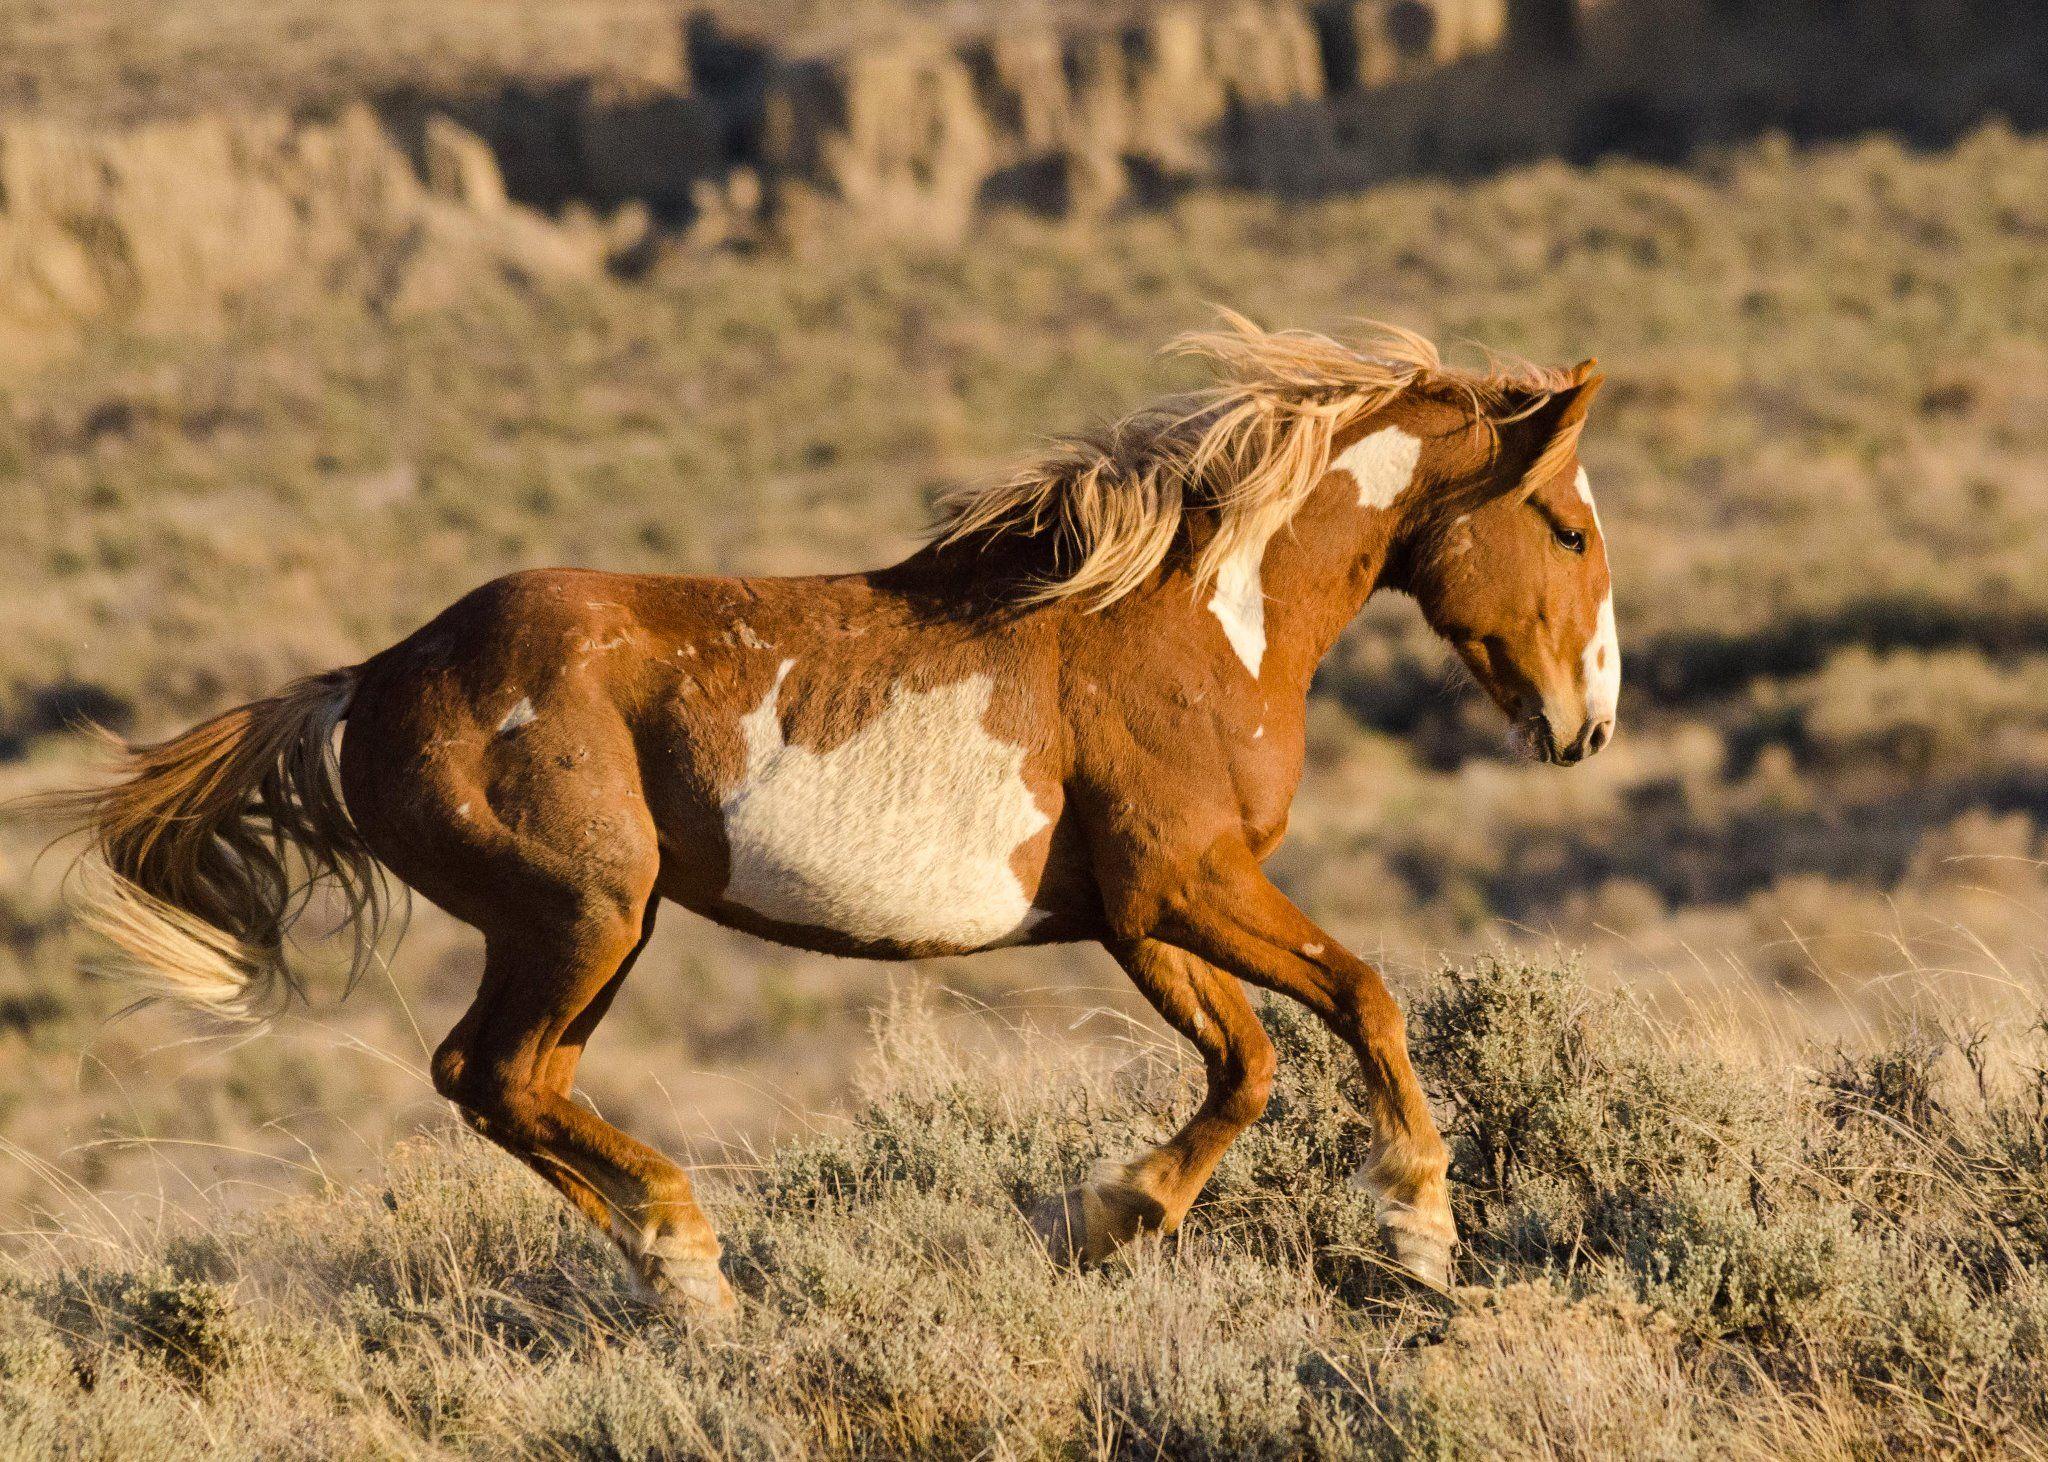 Дикая лошадь - описание, рацион питания, размножение и миграция (115 фото + видео)